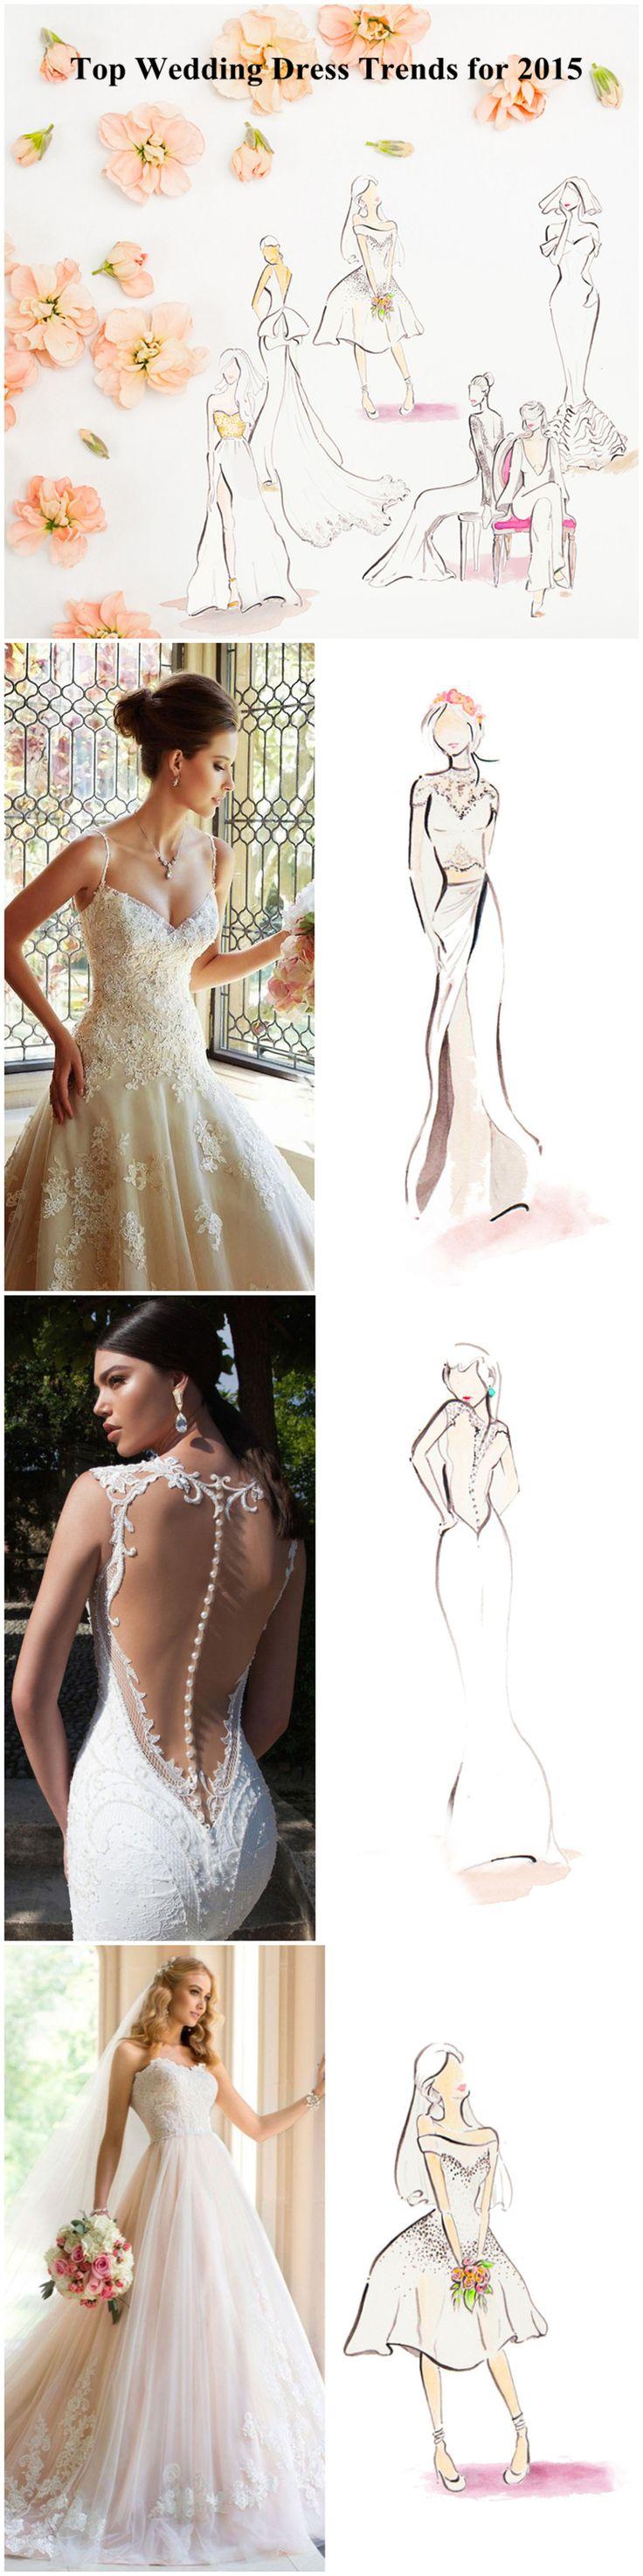 Best Wedding Dress Design in last 2015 !